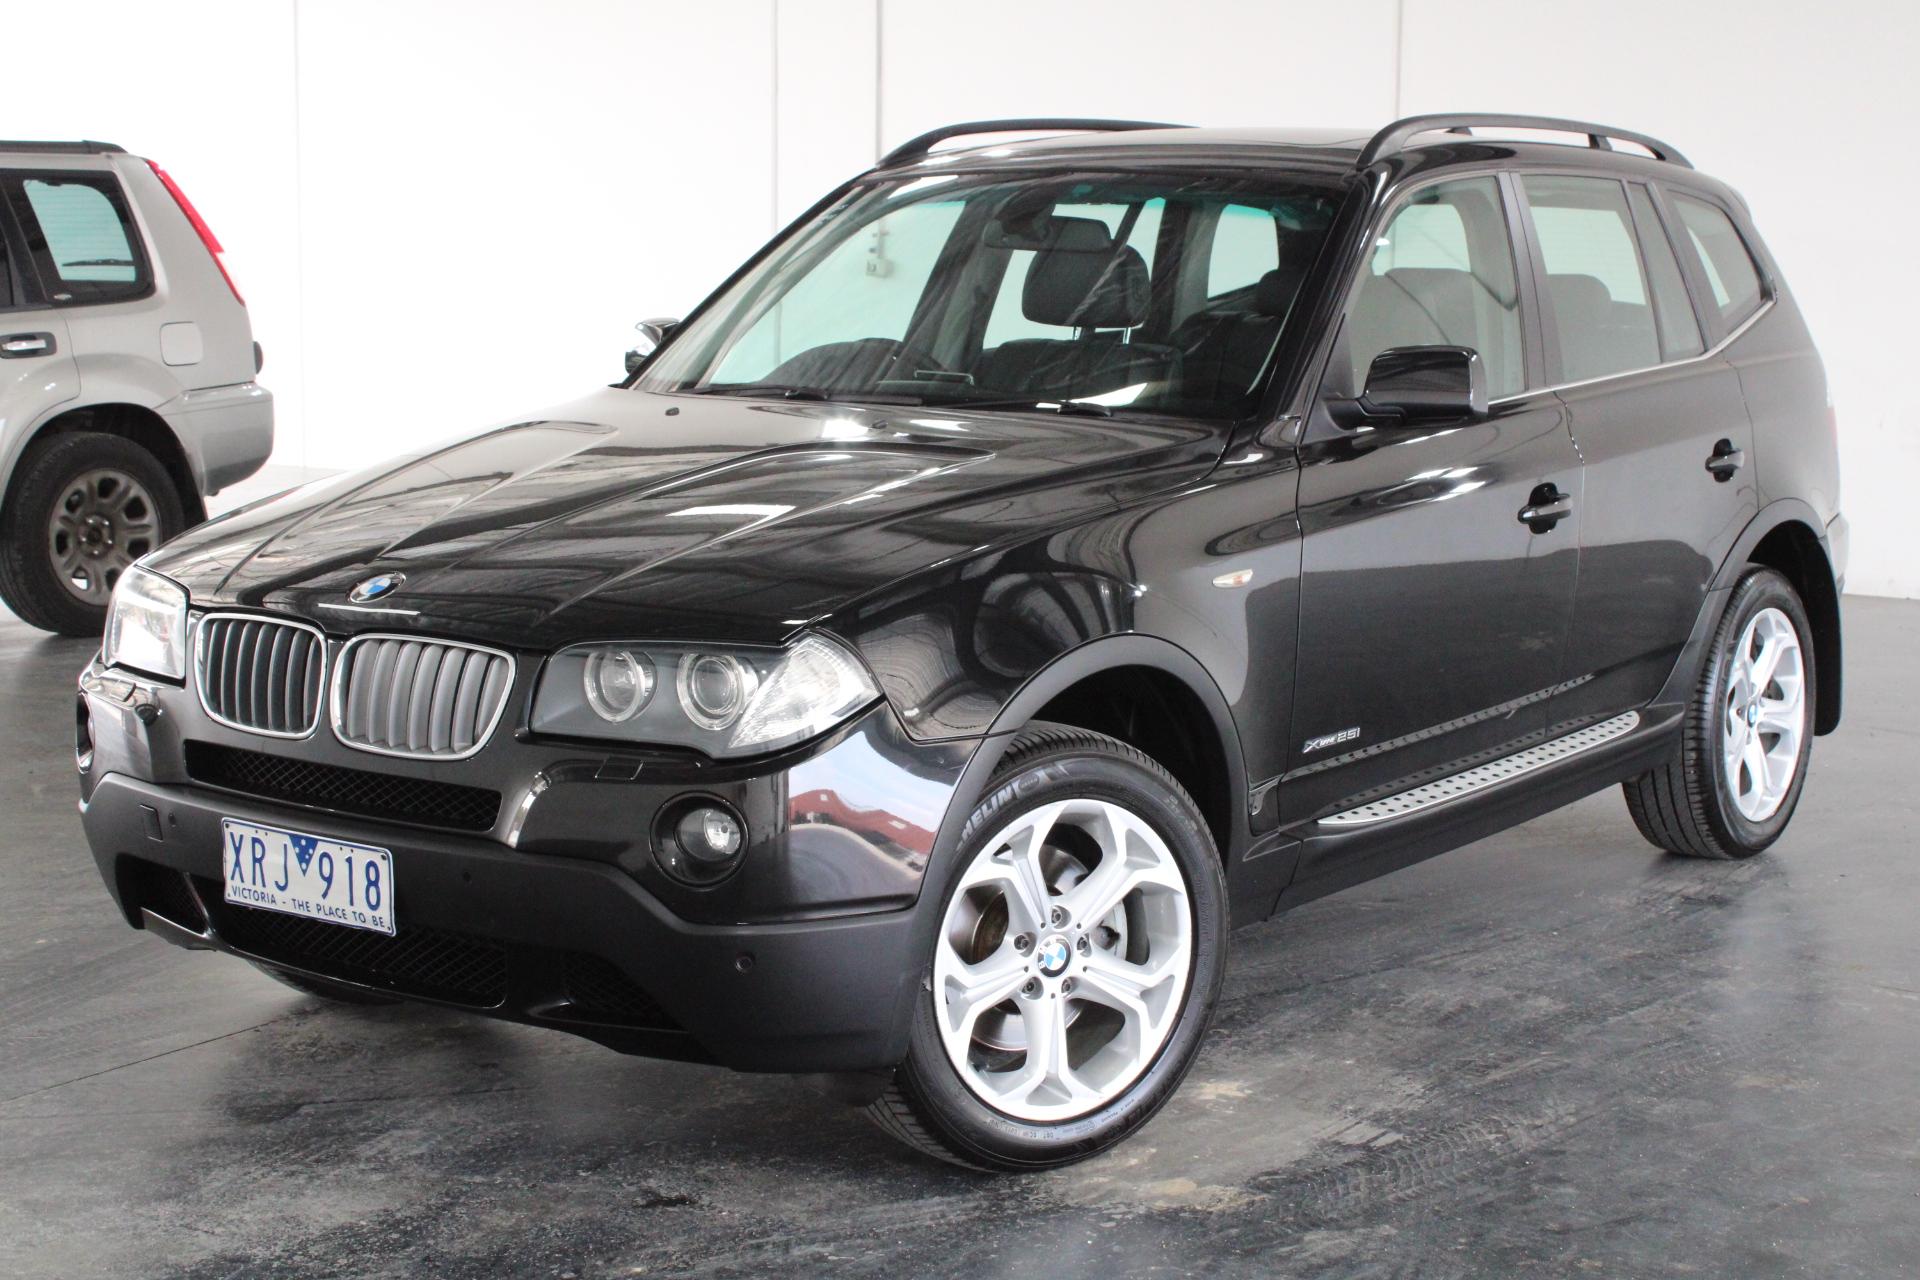 2009 BMW X3 2.5si E83 Automatic Wagon